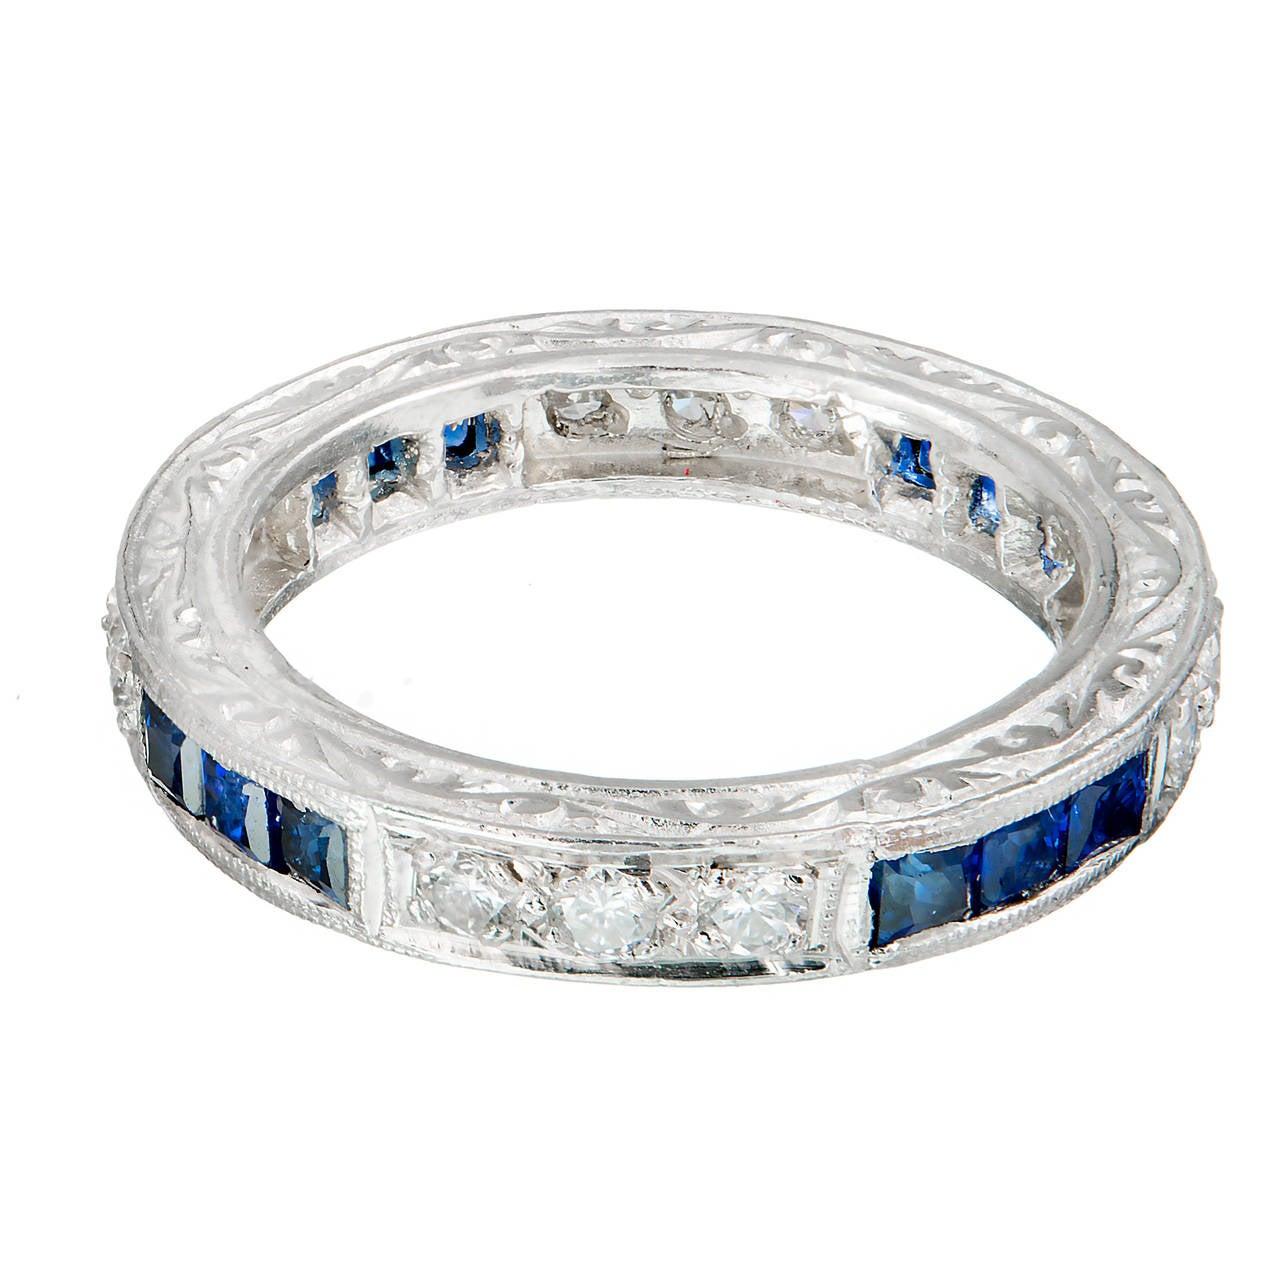 Peter Suchy Sapphire Round Diamond Platinum Eternity Band Ring 2